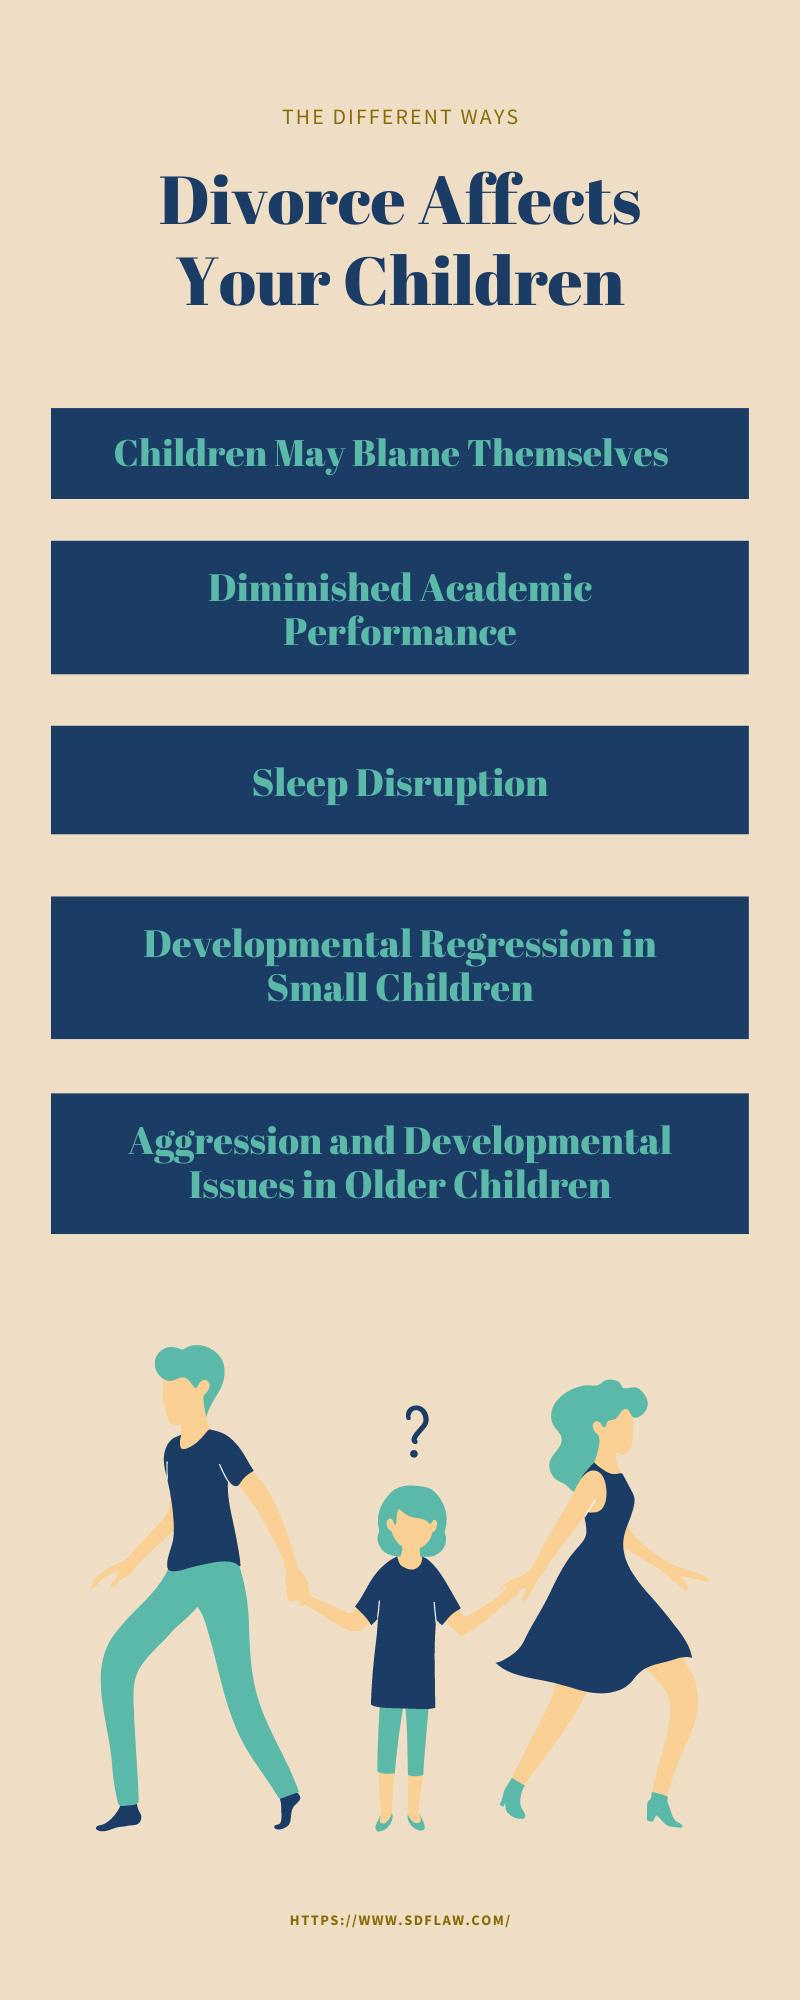 The Different Ways Divorce Affects Your Children